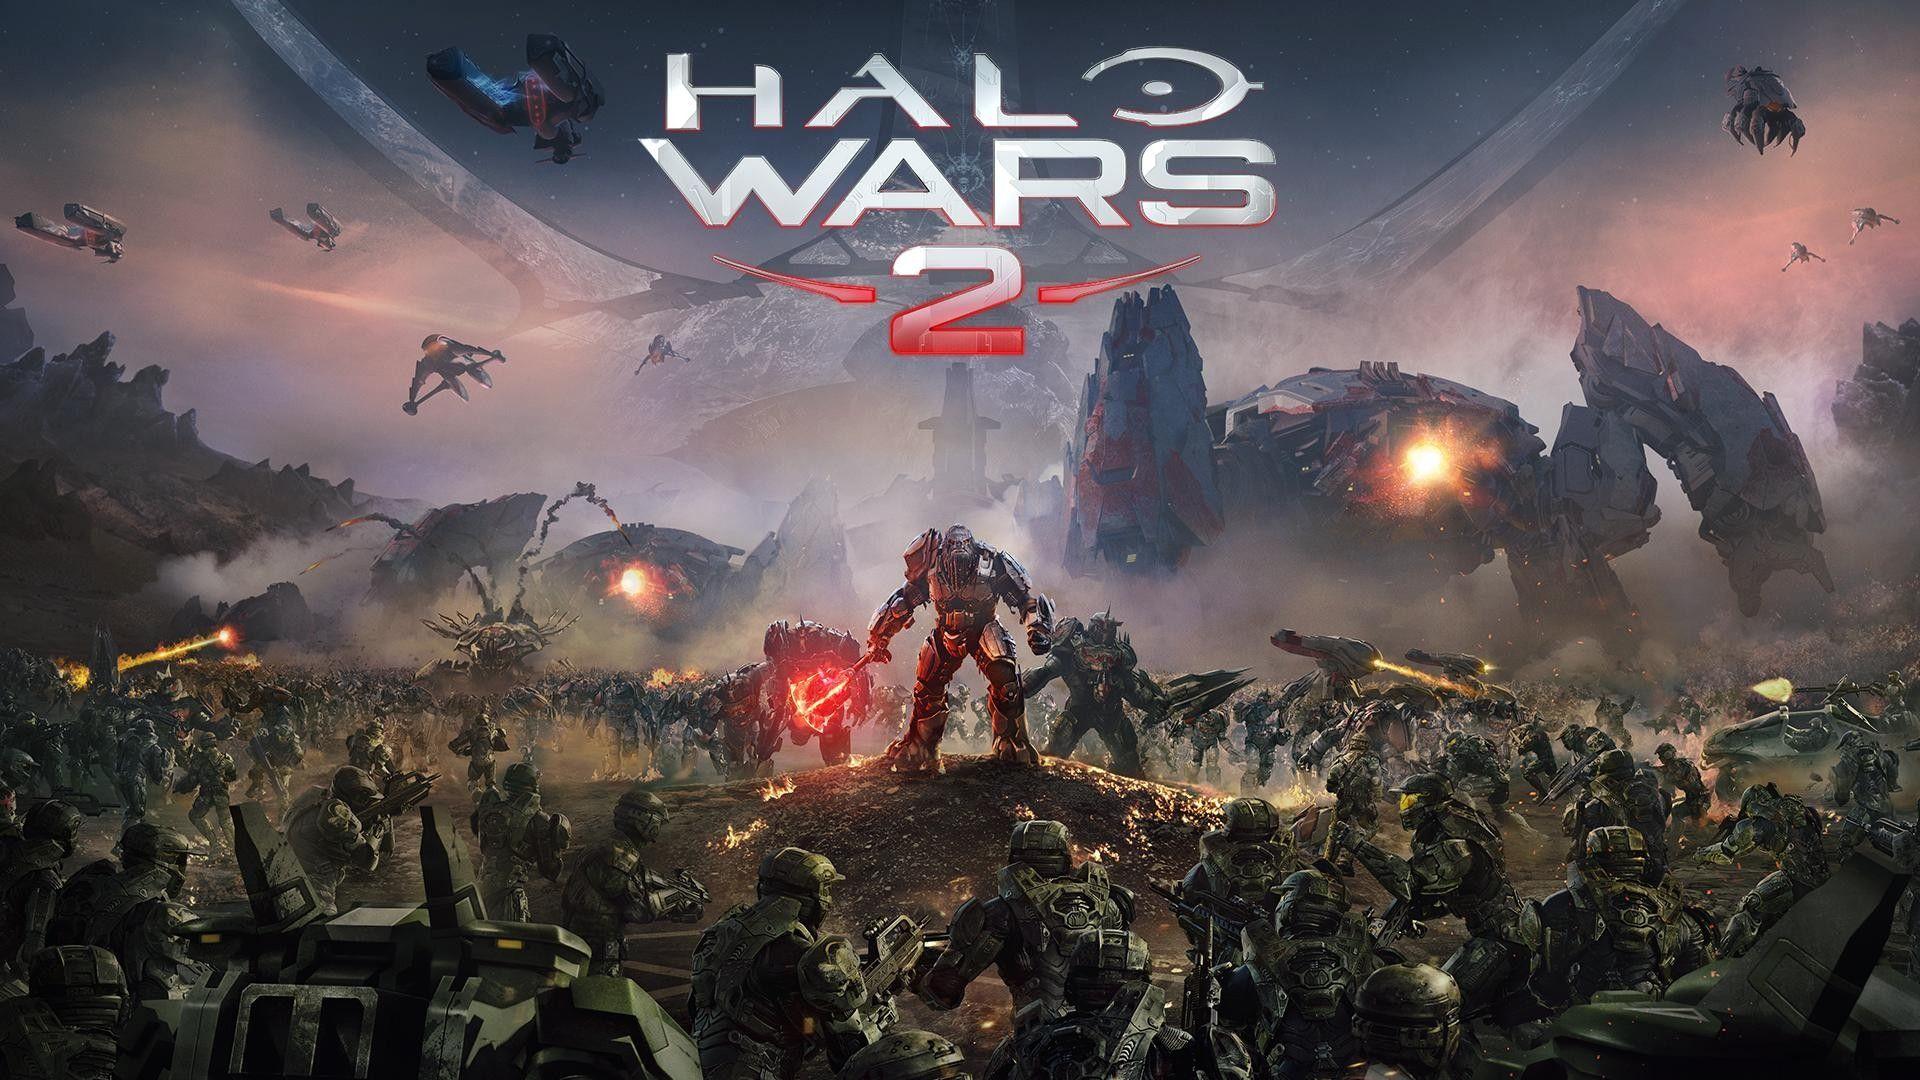 Halo Wars 2 Wallpapers Free Hd Halo Xbox One Xbox